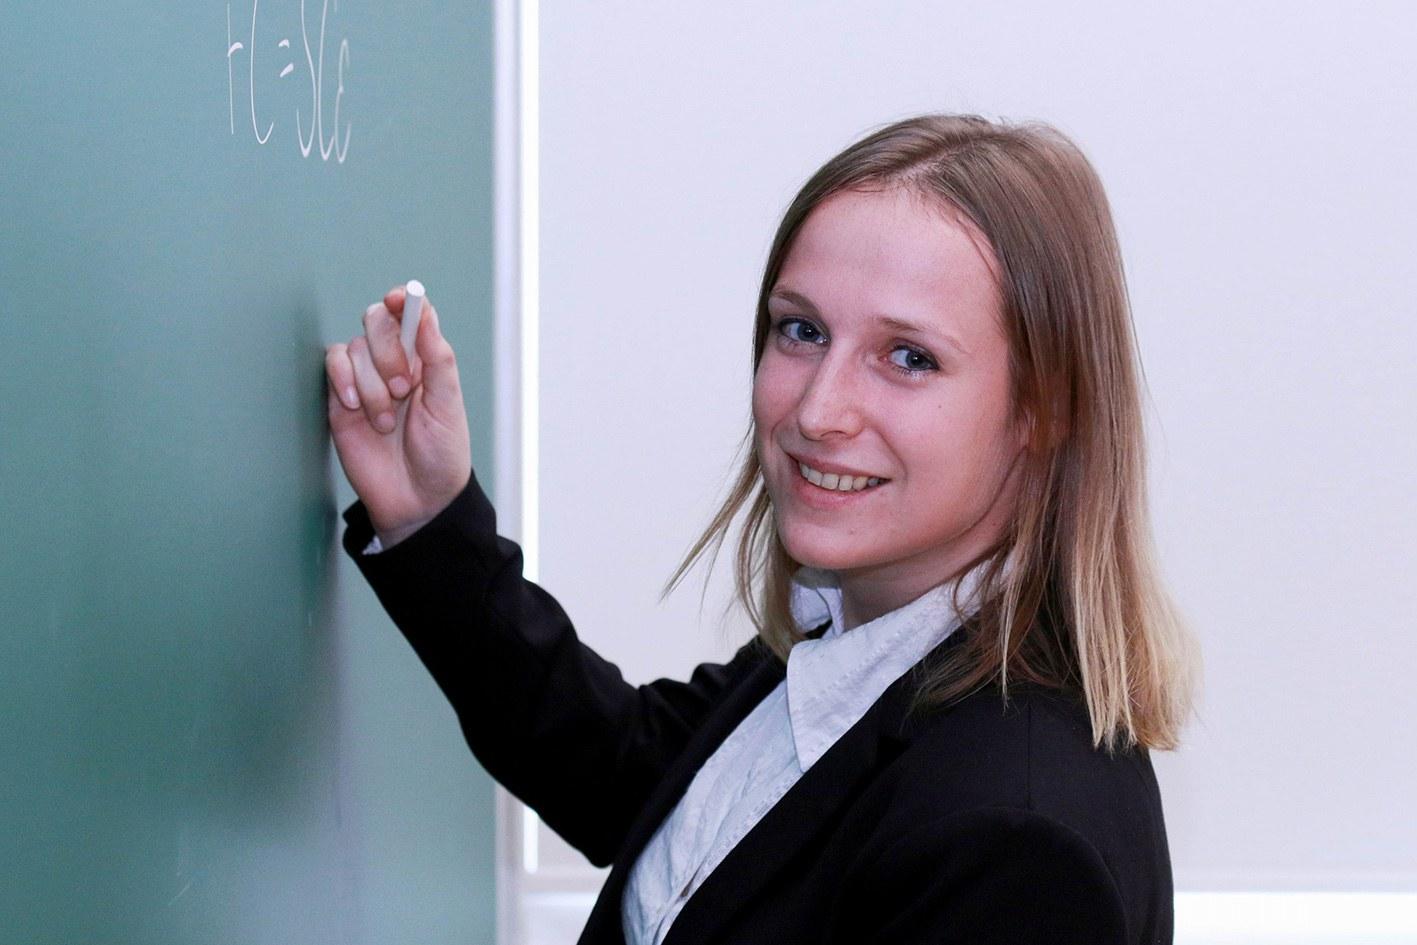 Dr. Eva Perlt